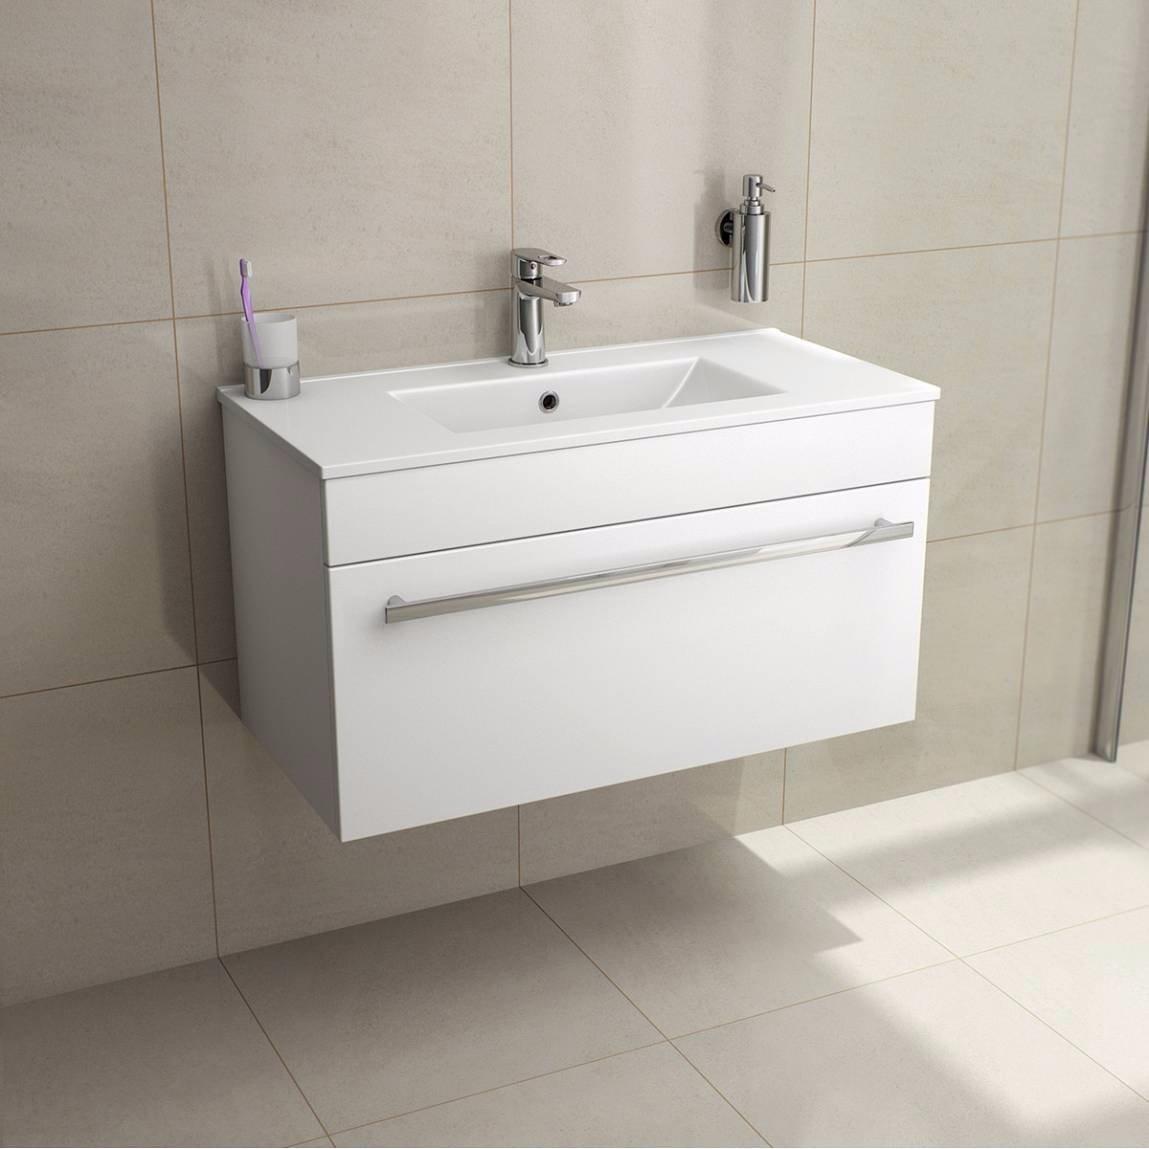 Minimalist gloss white vanity unit 600 800 or 1000mm - Veebath Sphinx 800mm White Gloss Wall Hung Vanity Unit With Ceramic Basin Sink Bathroom Storage Unit Furniture Cabinet Amazon Co Uk Kitchen Home